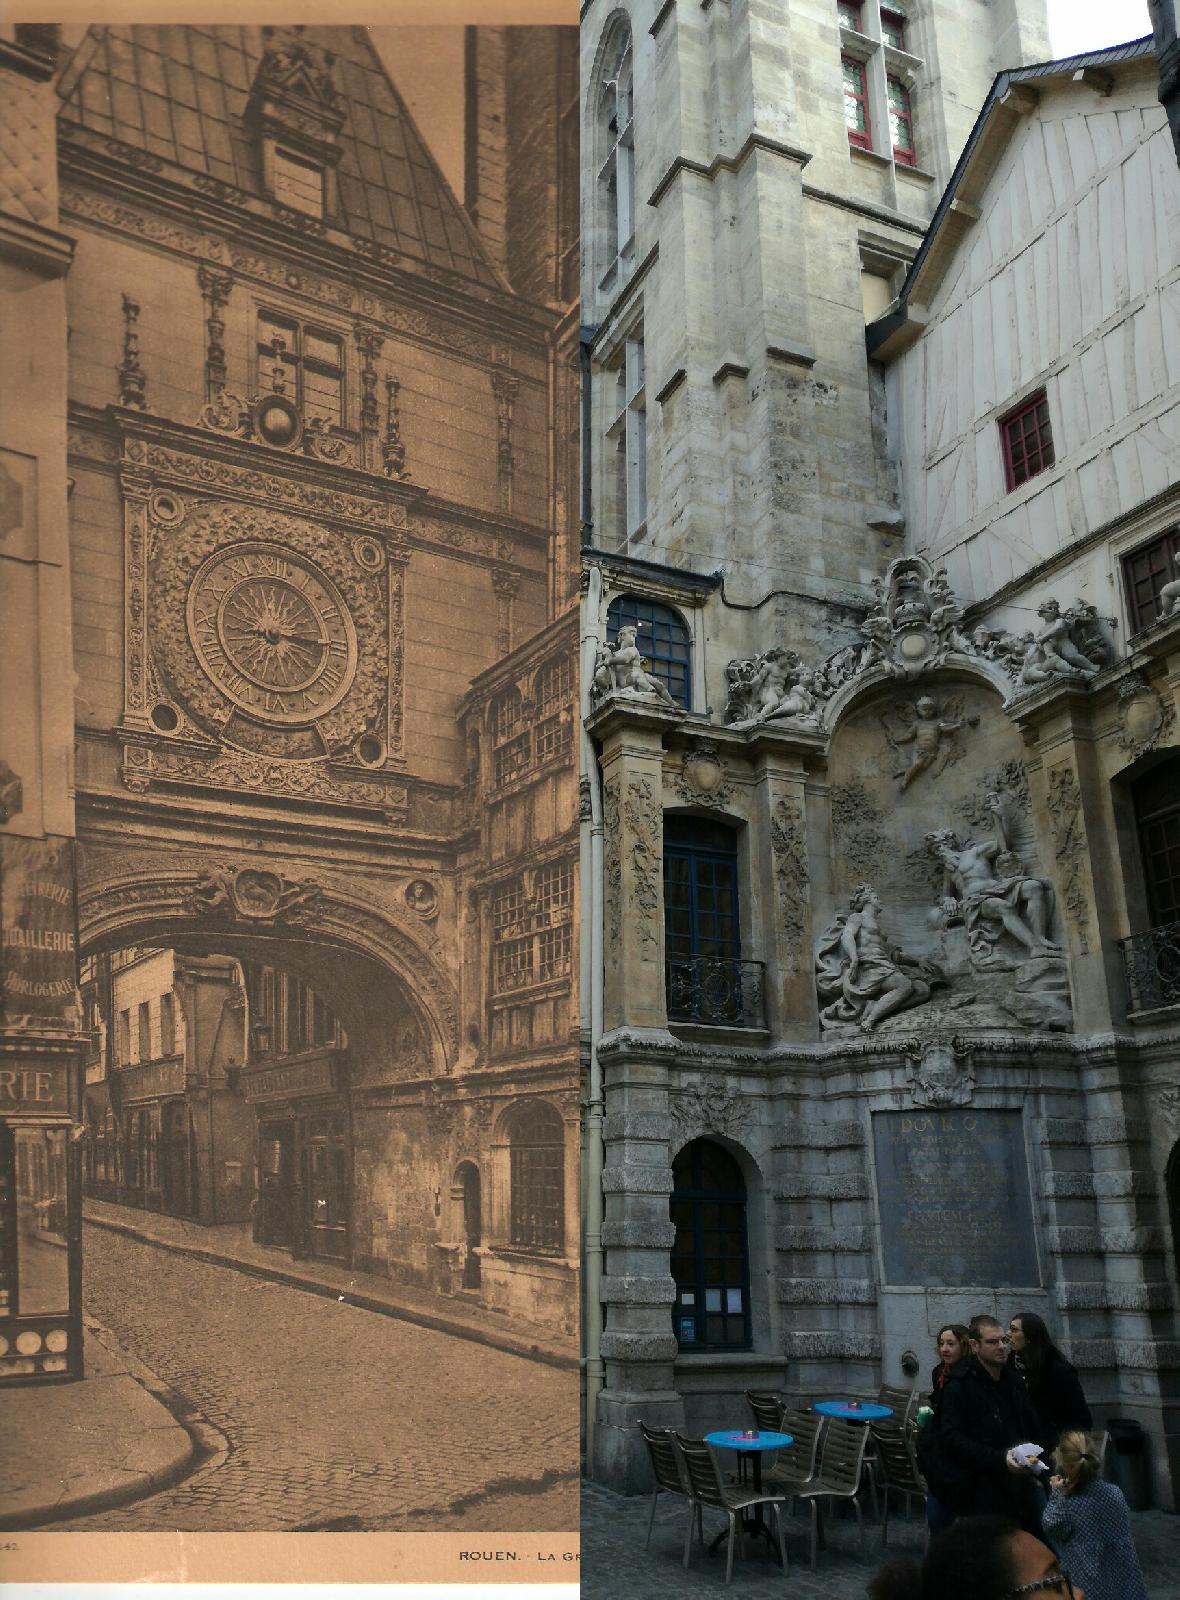 Rouen - La Grosse Horloge de ROUEN